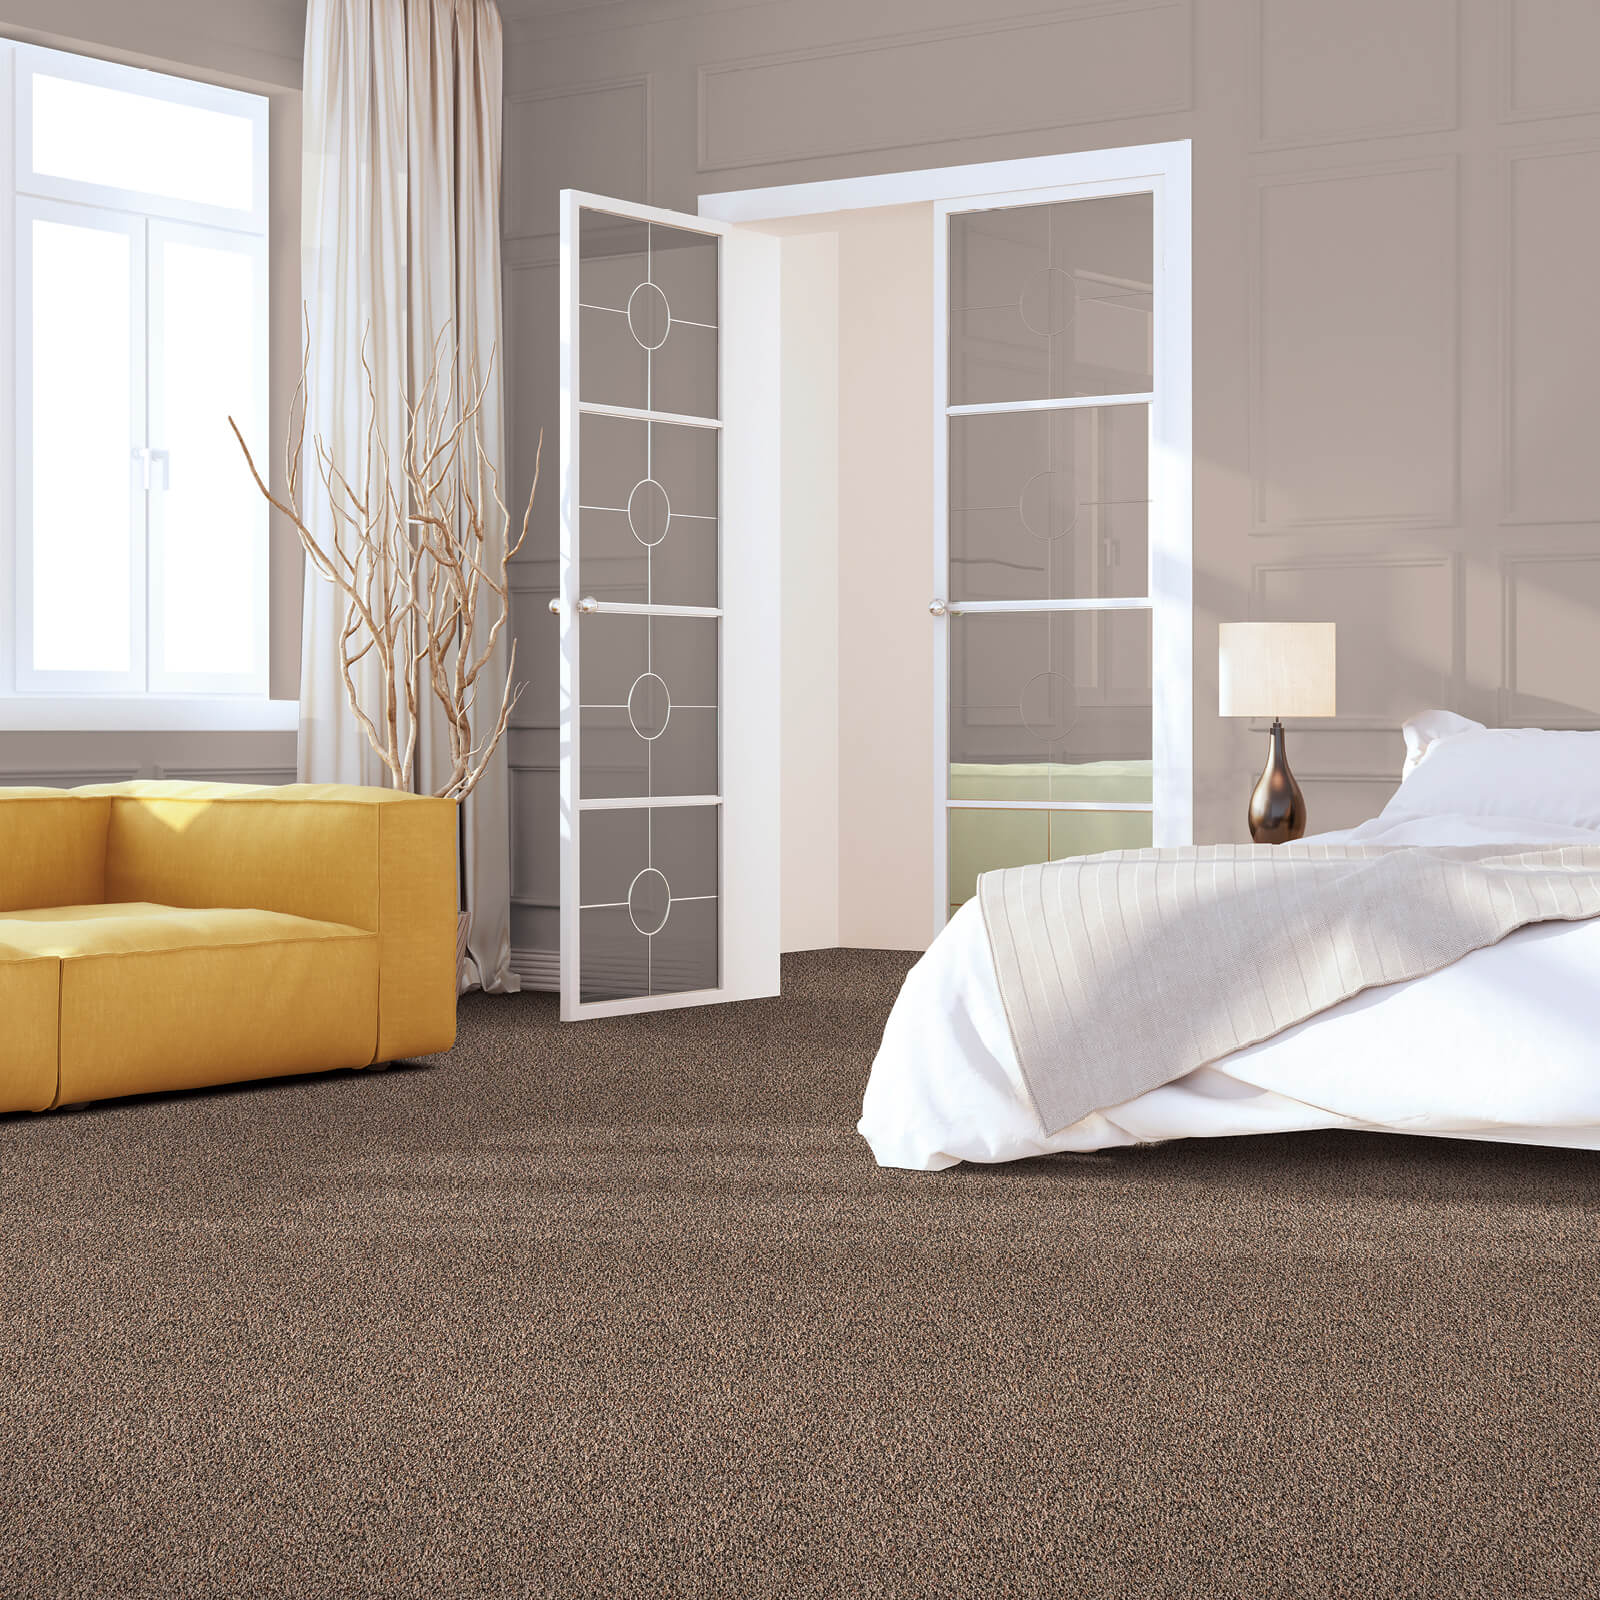 Impressive selection of carpet | McSwain Carpet & Floors